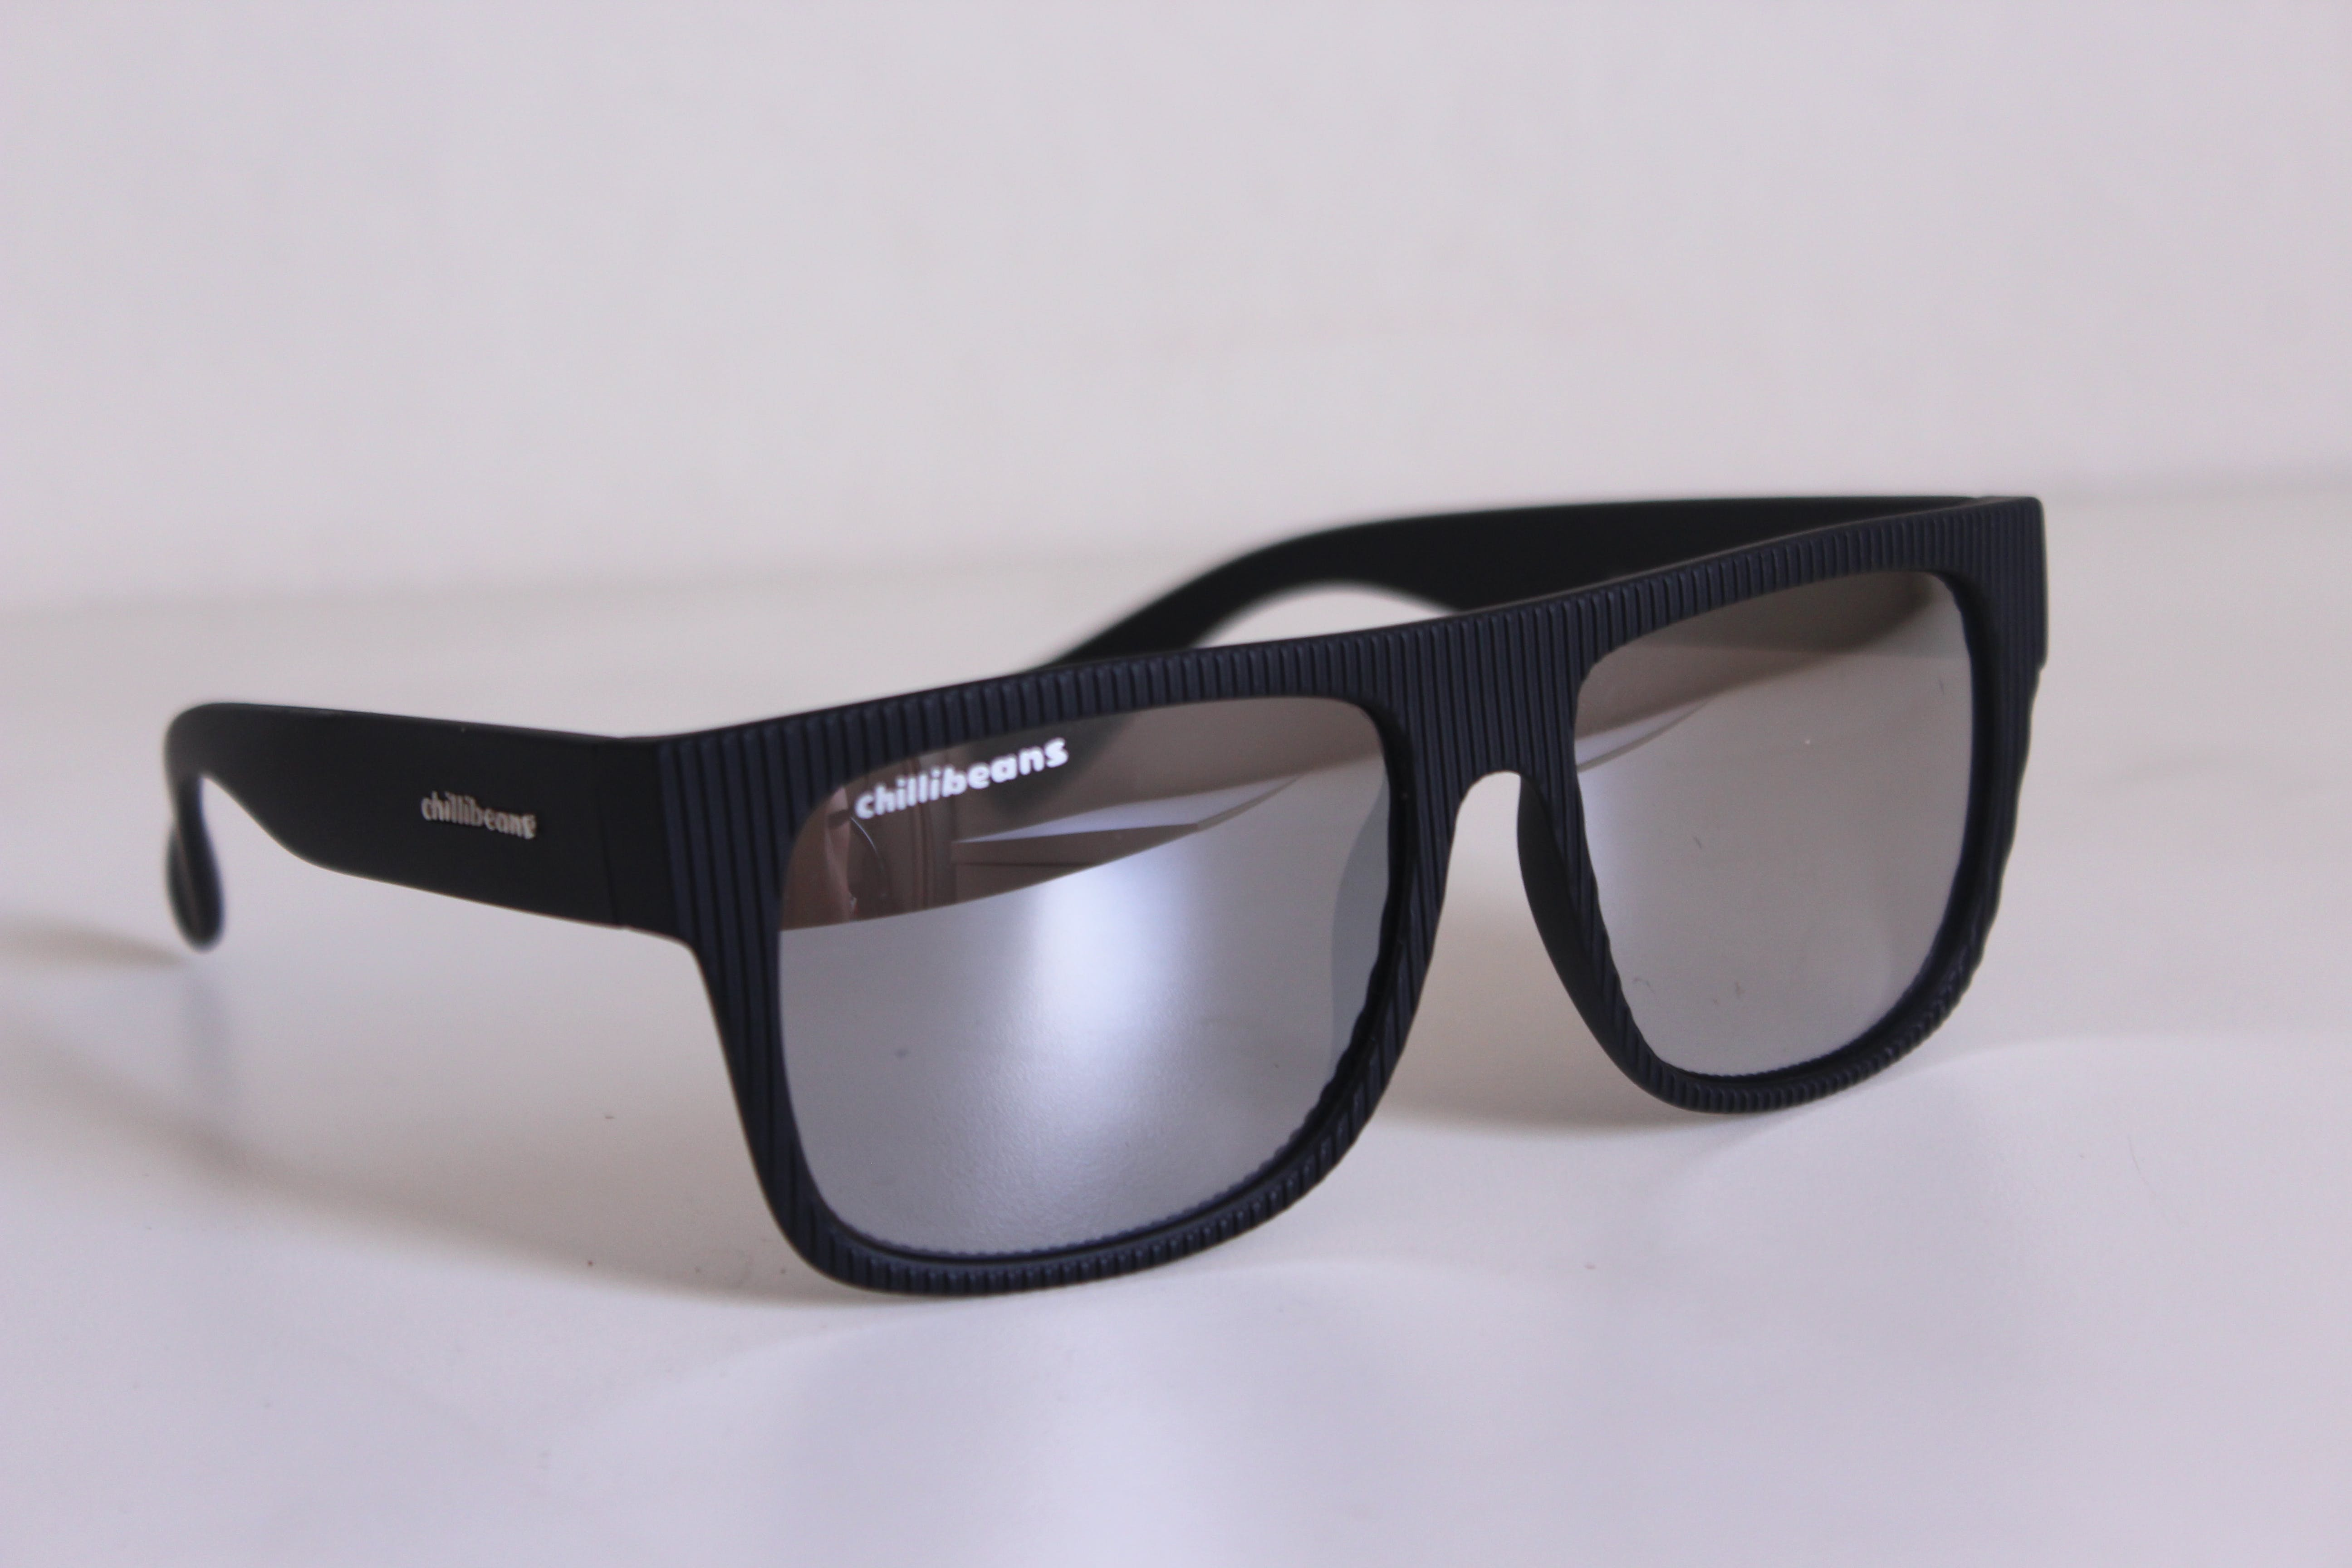 Free stock photo of sun glasses